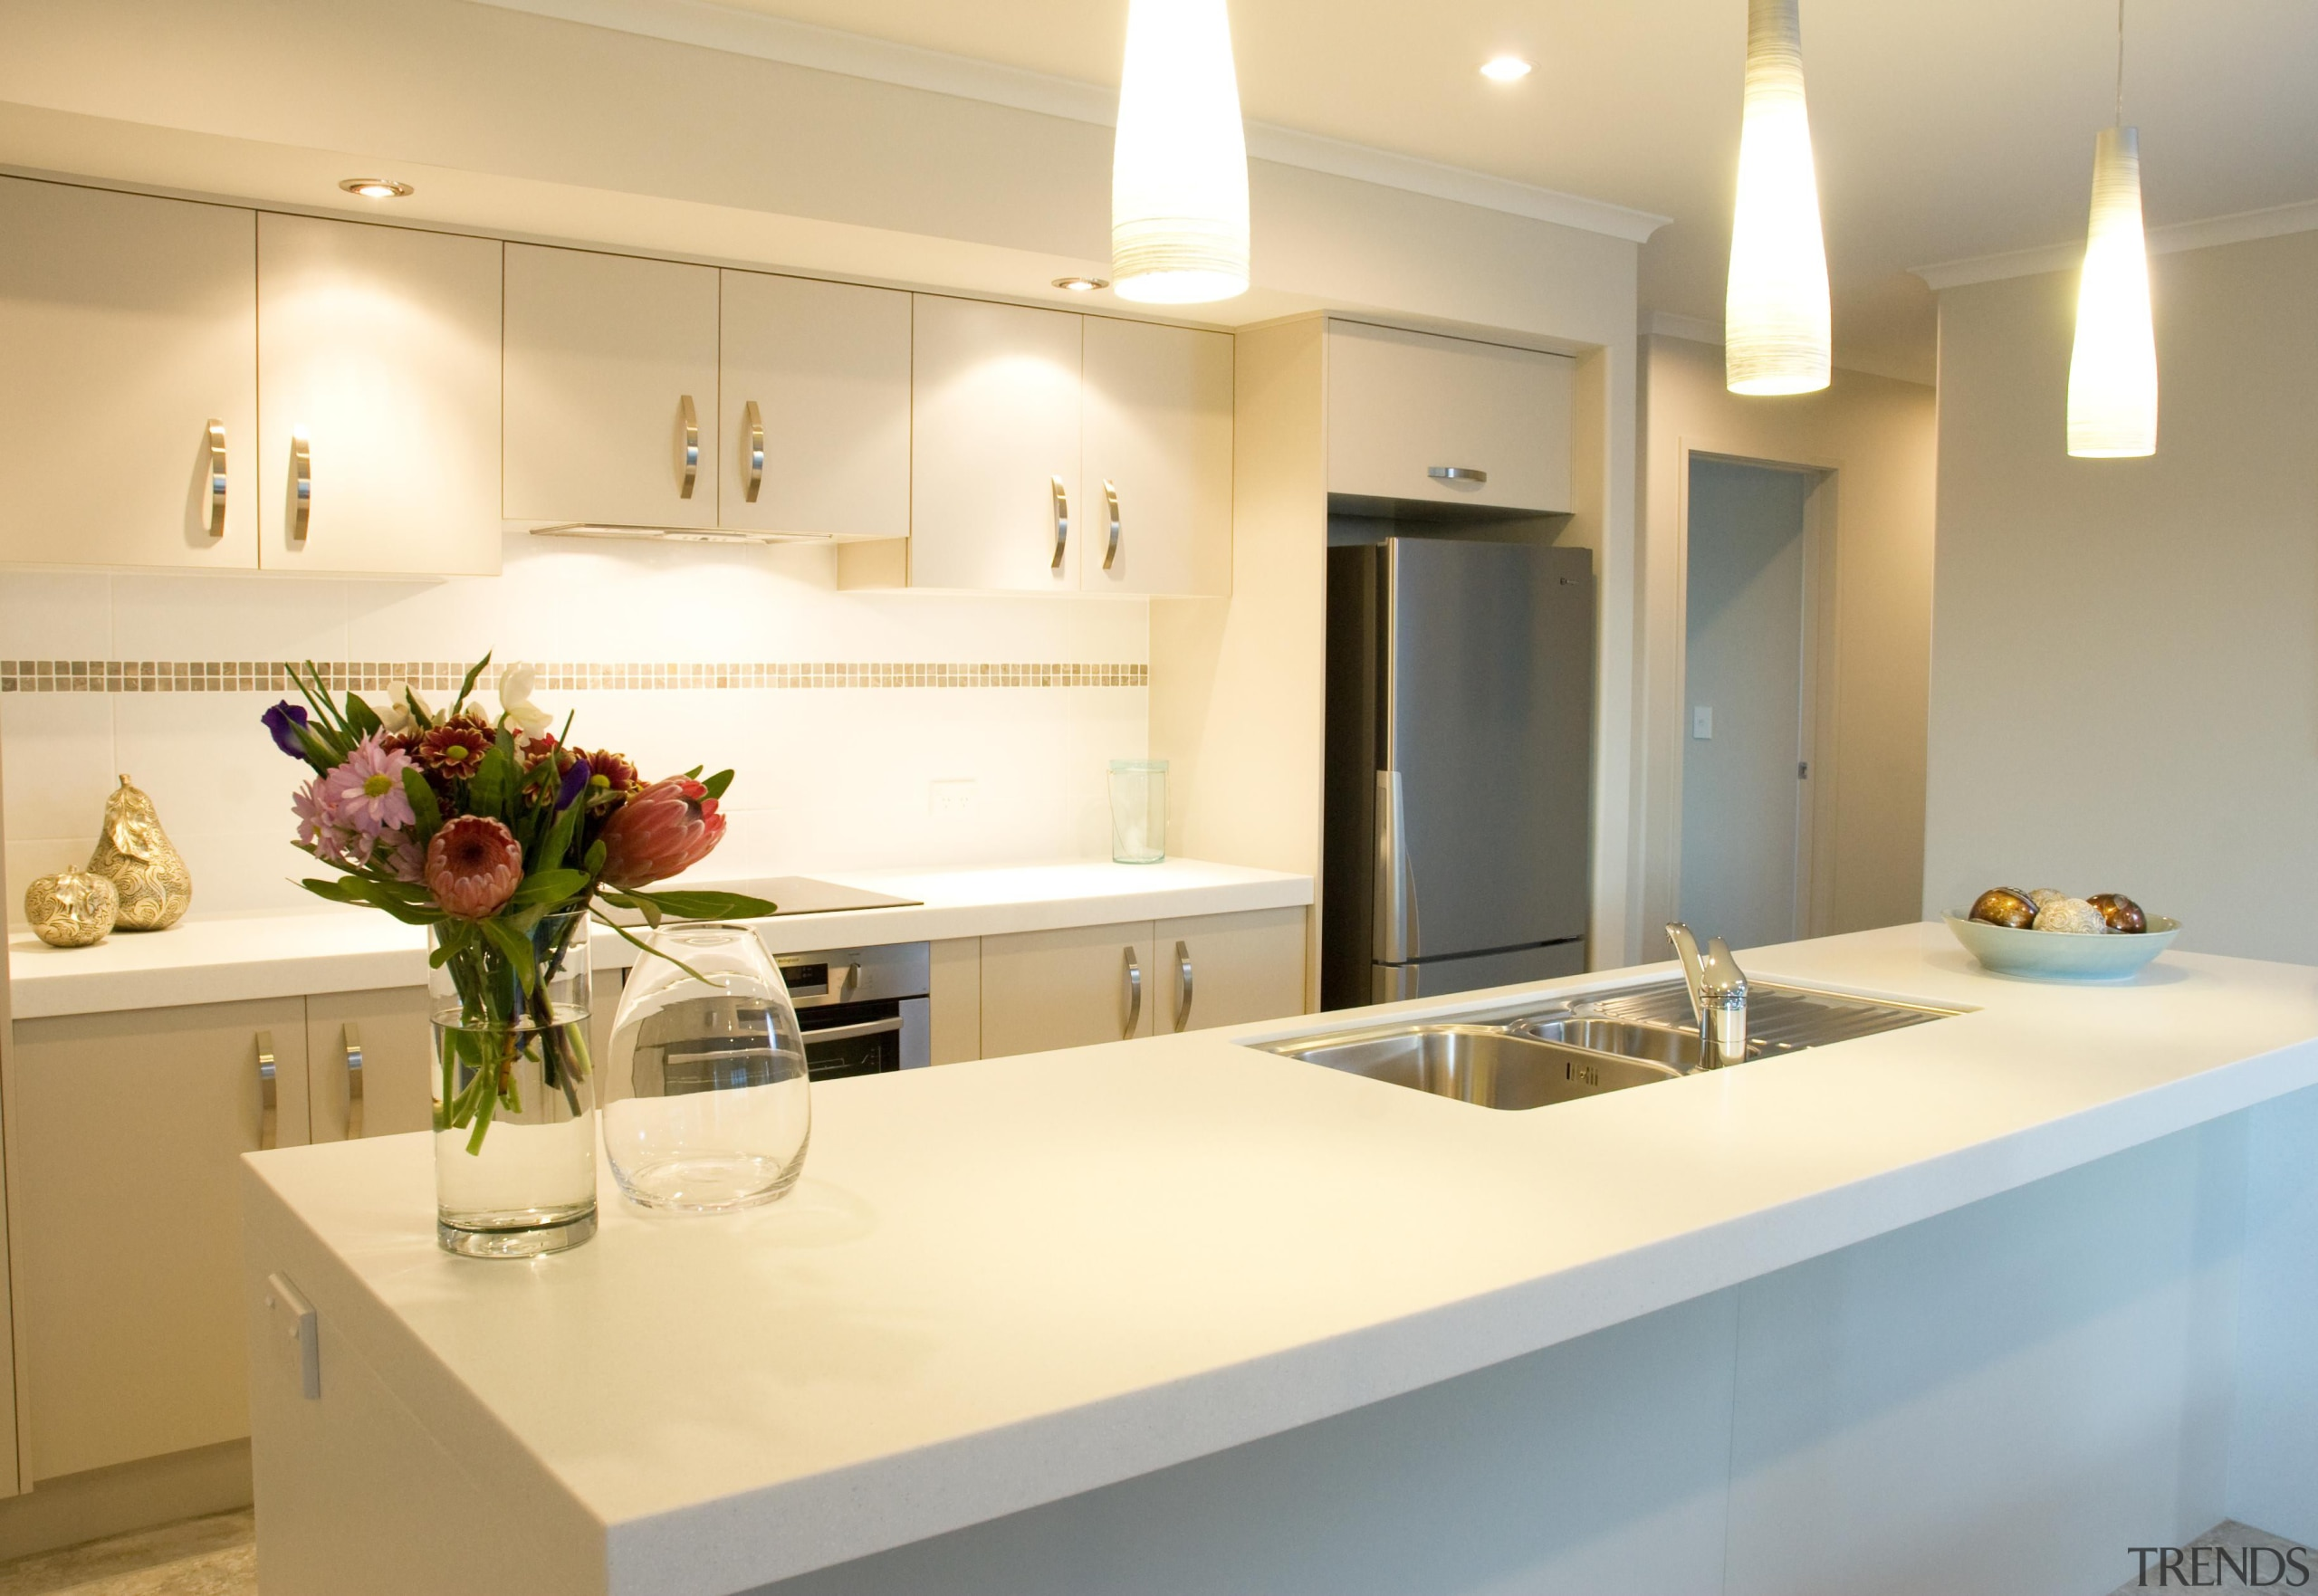 For more information, please visit www.gjgardner.co.nz countertop, interior design, kitchen, property, real estate, room, yellow, orange